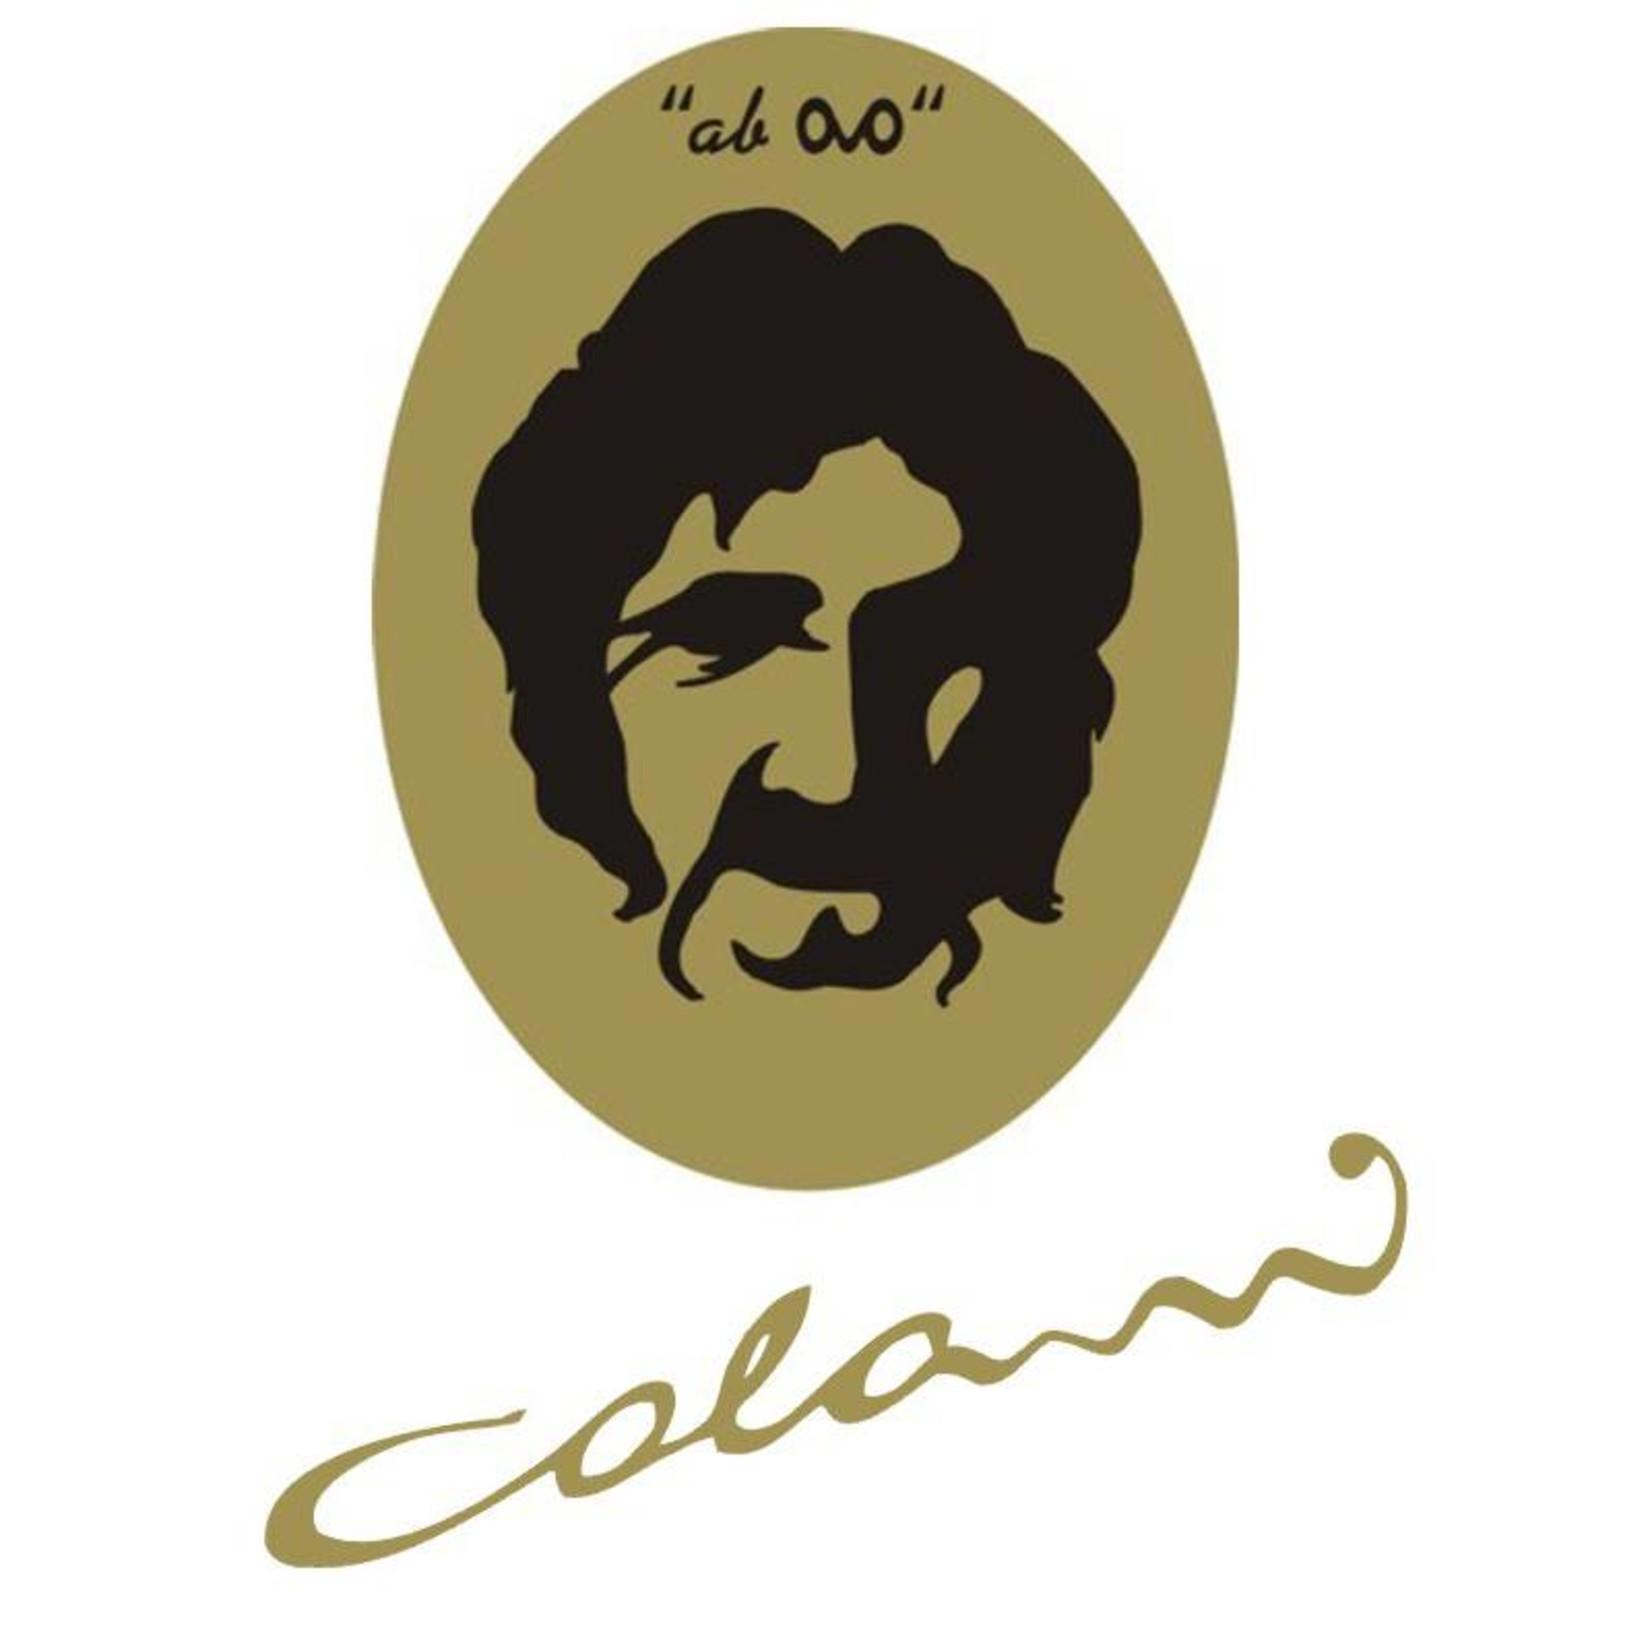 Colani Porzellanserie Colani Eierbecher in Blau aus Porzellan